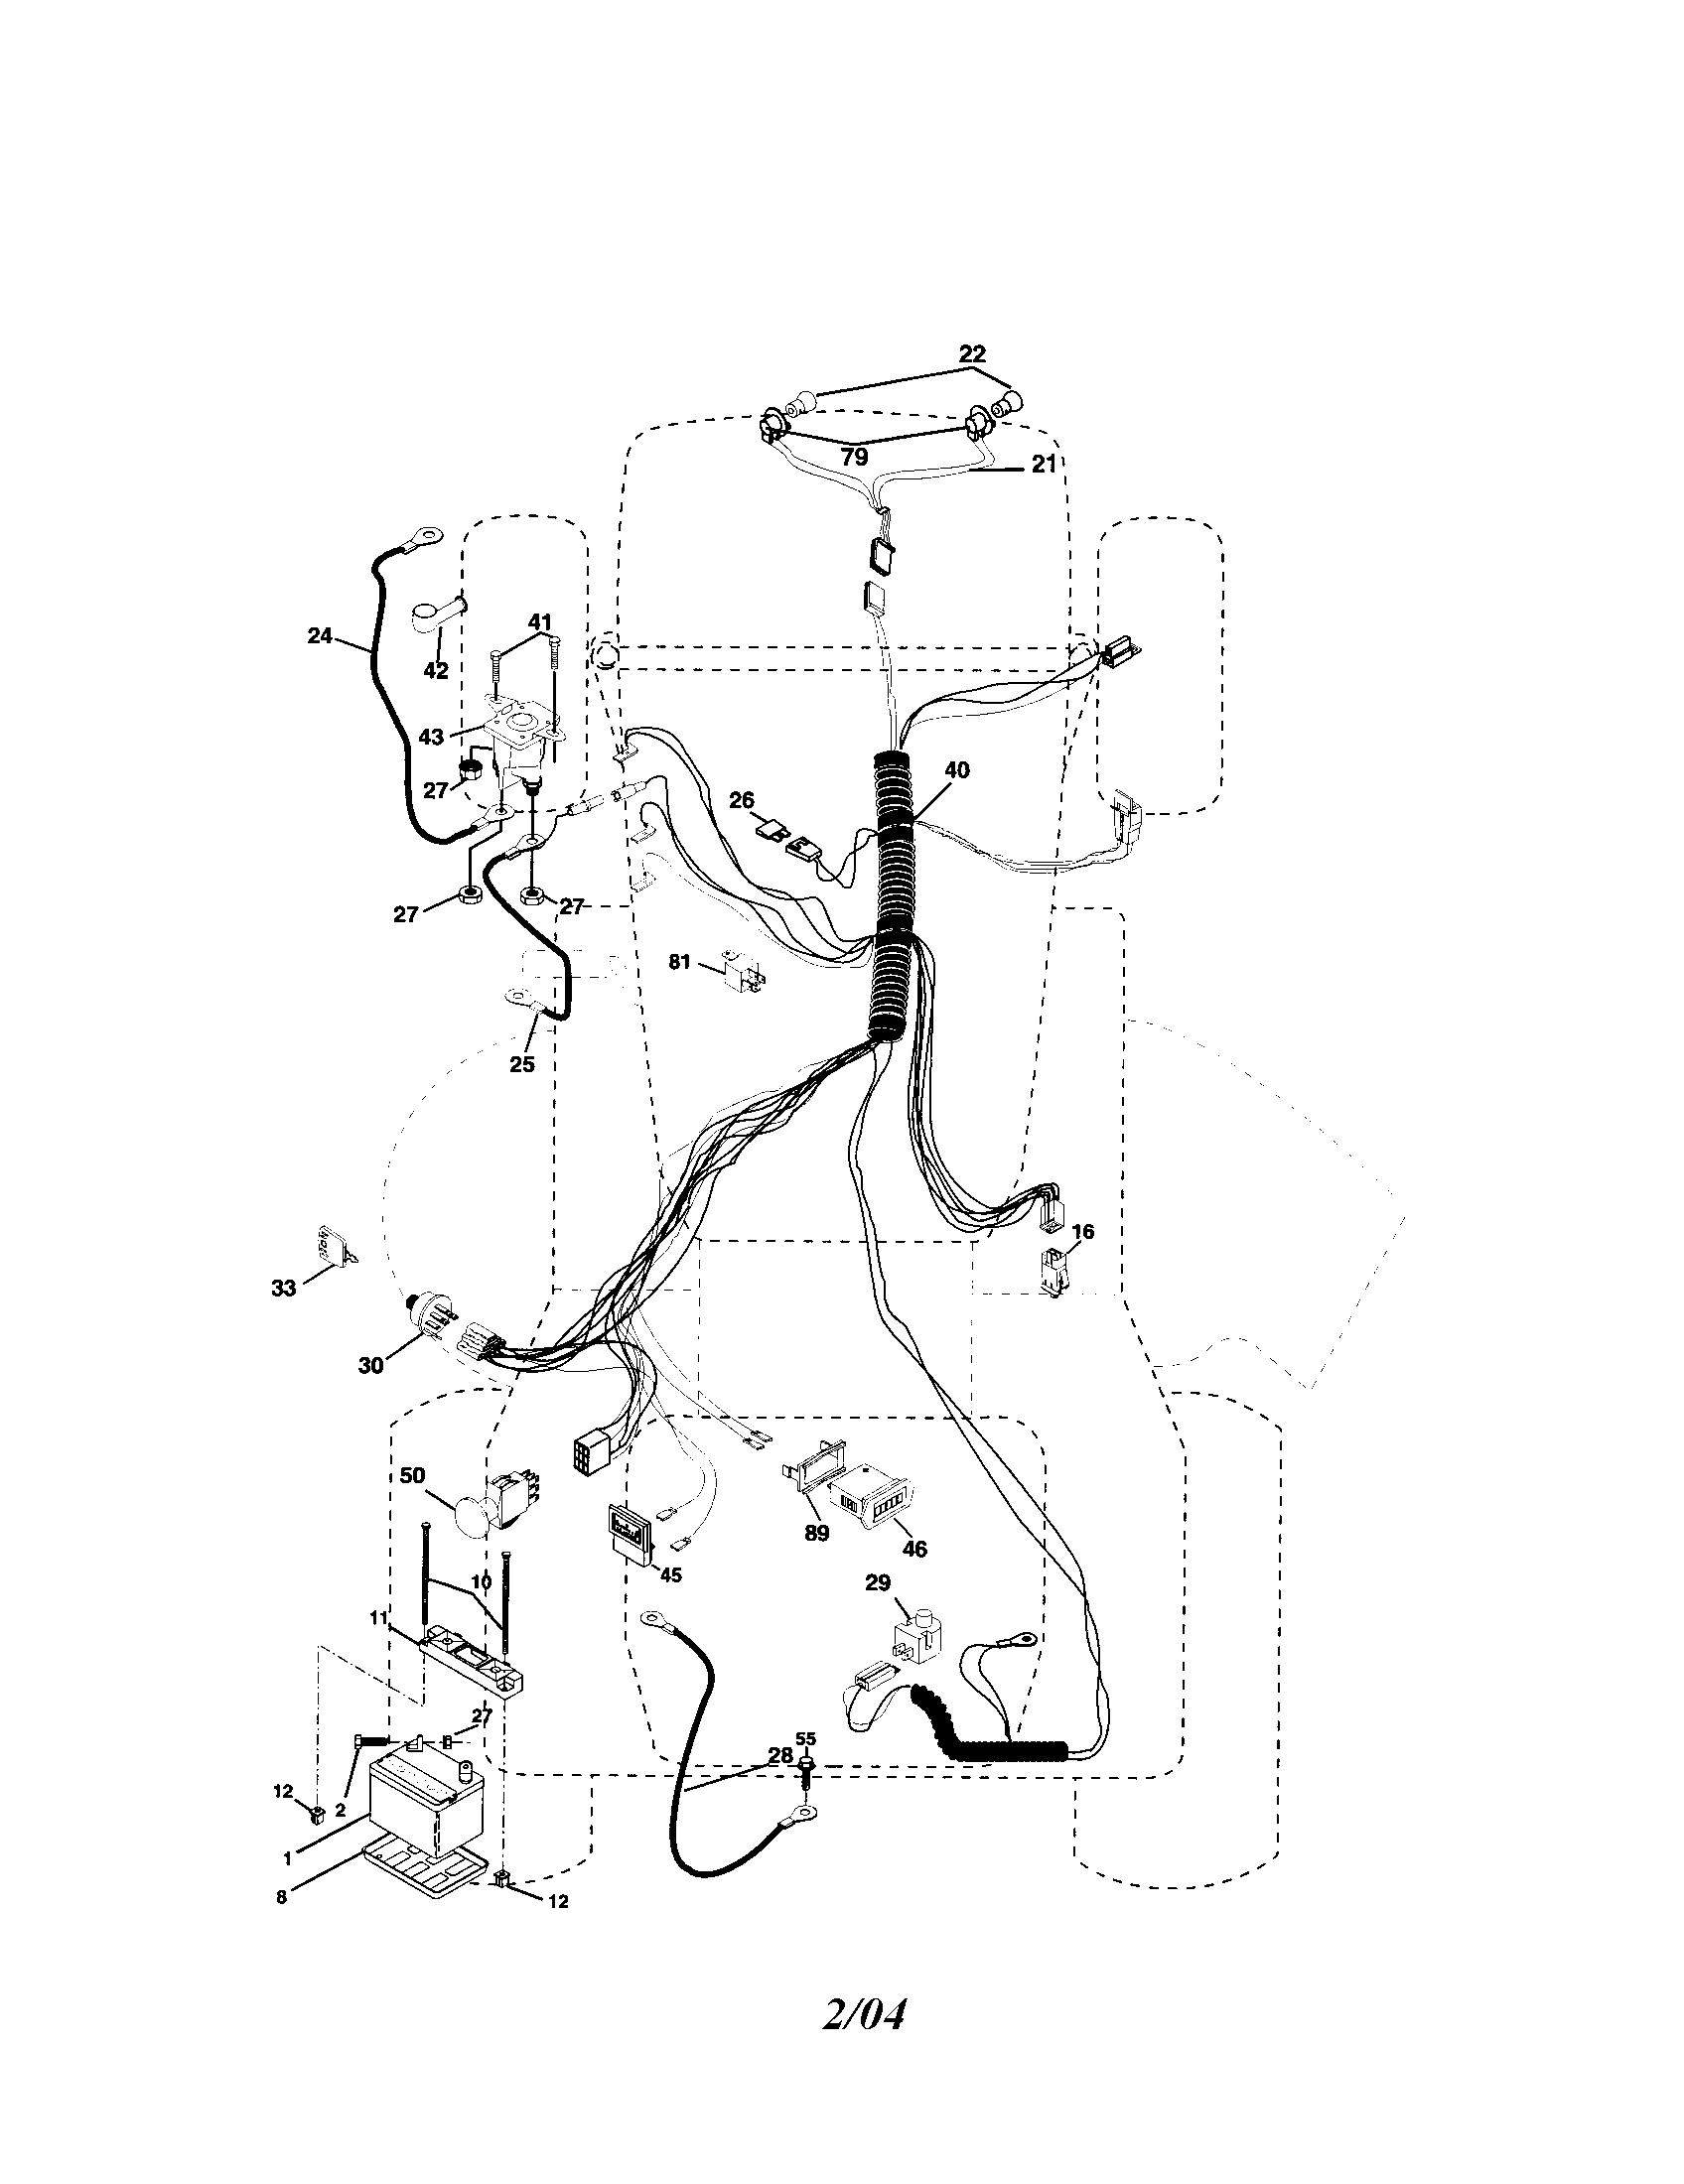 Sear Riding Mower Wiring Diagram